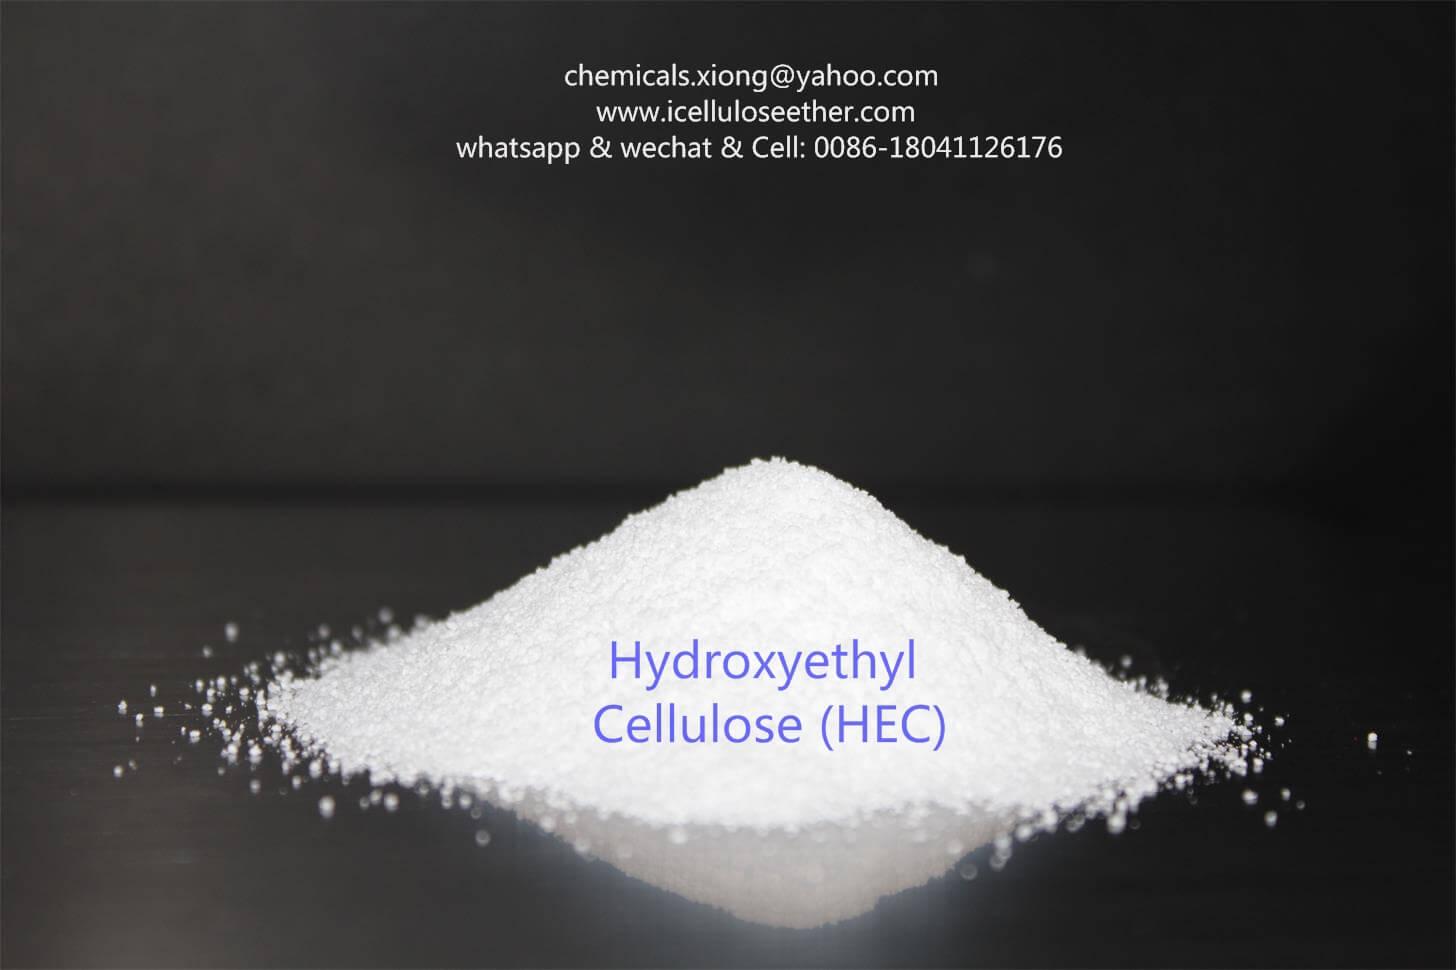 x Hydroxyethyl Cellulose (HEC),CAS 9004-62-0,Wallpaper adhesives